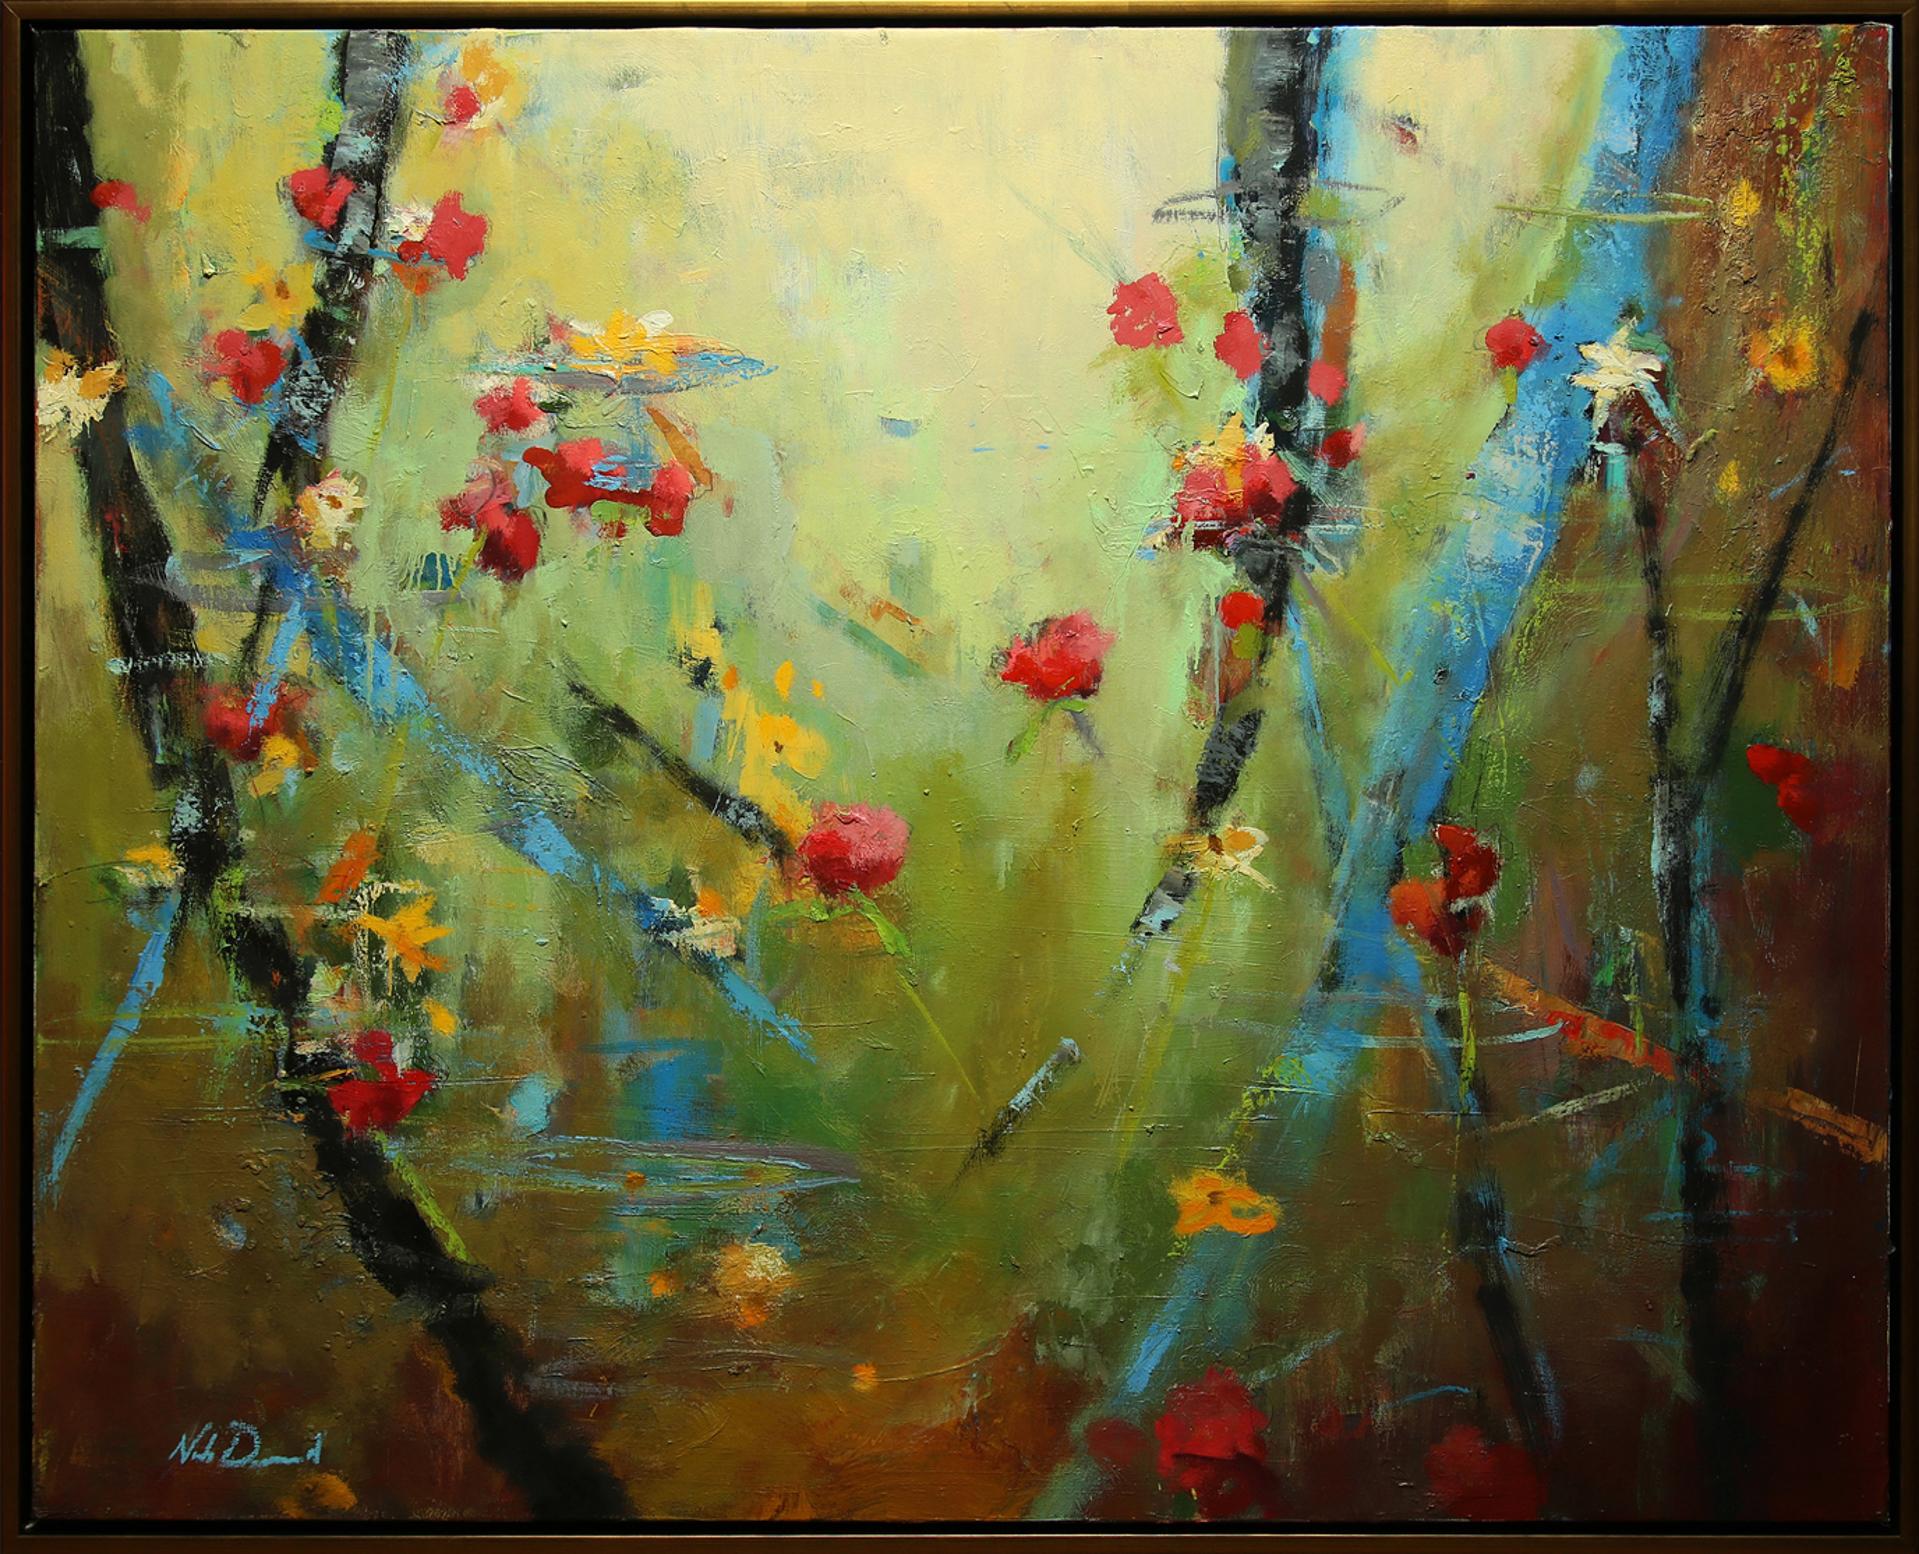 Springtime Glory by Noah Desmond